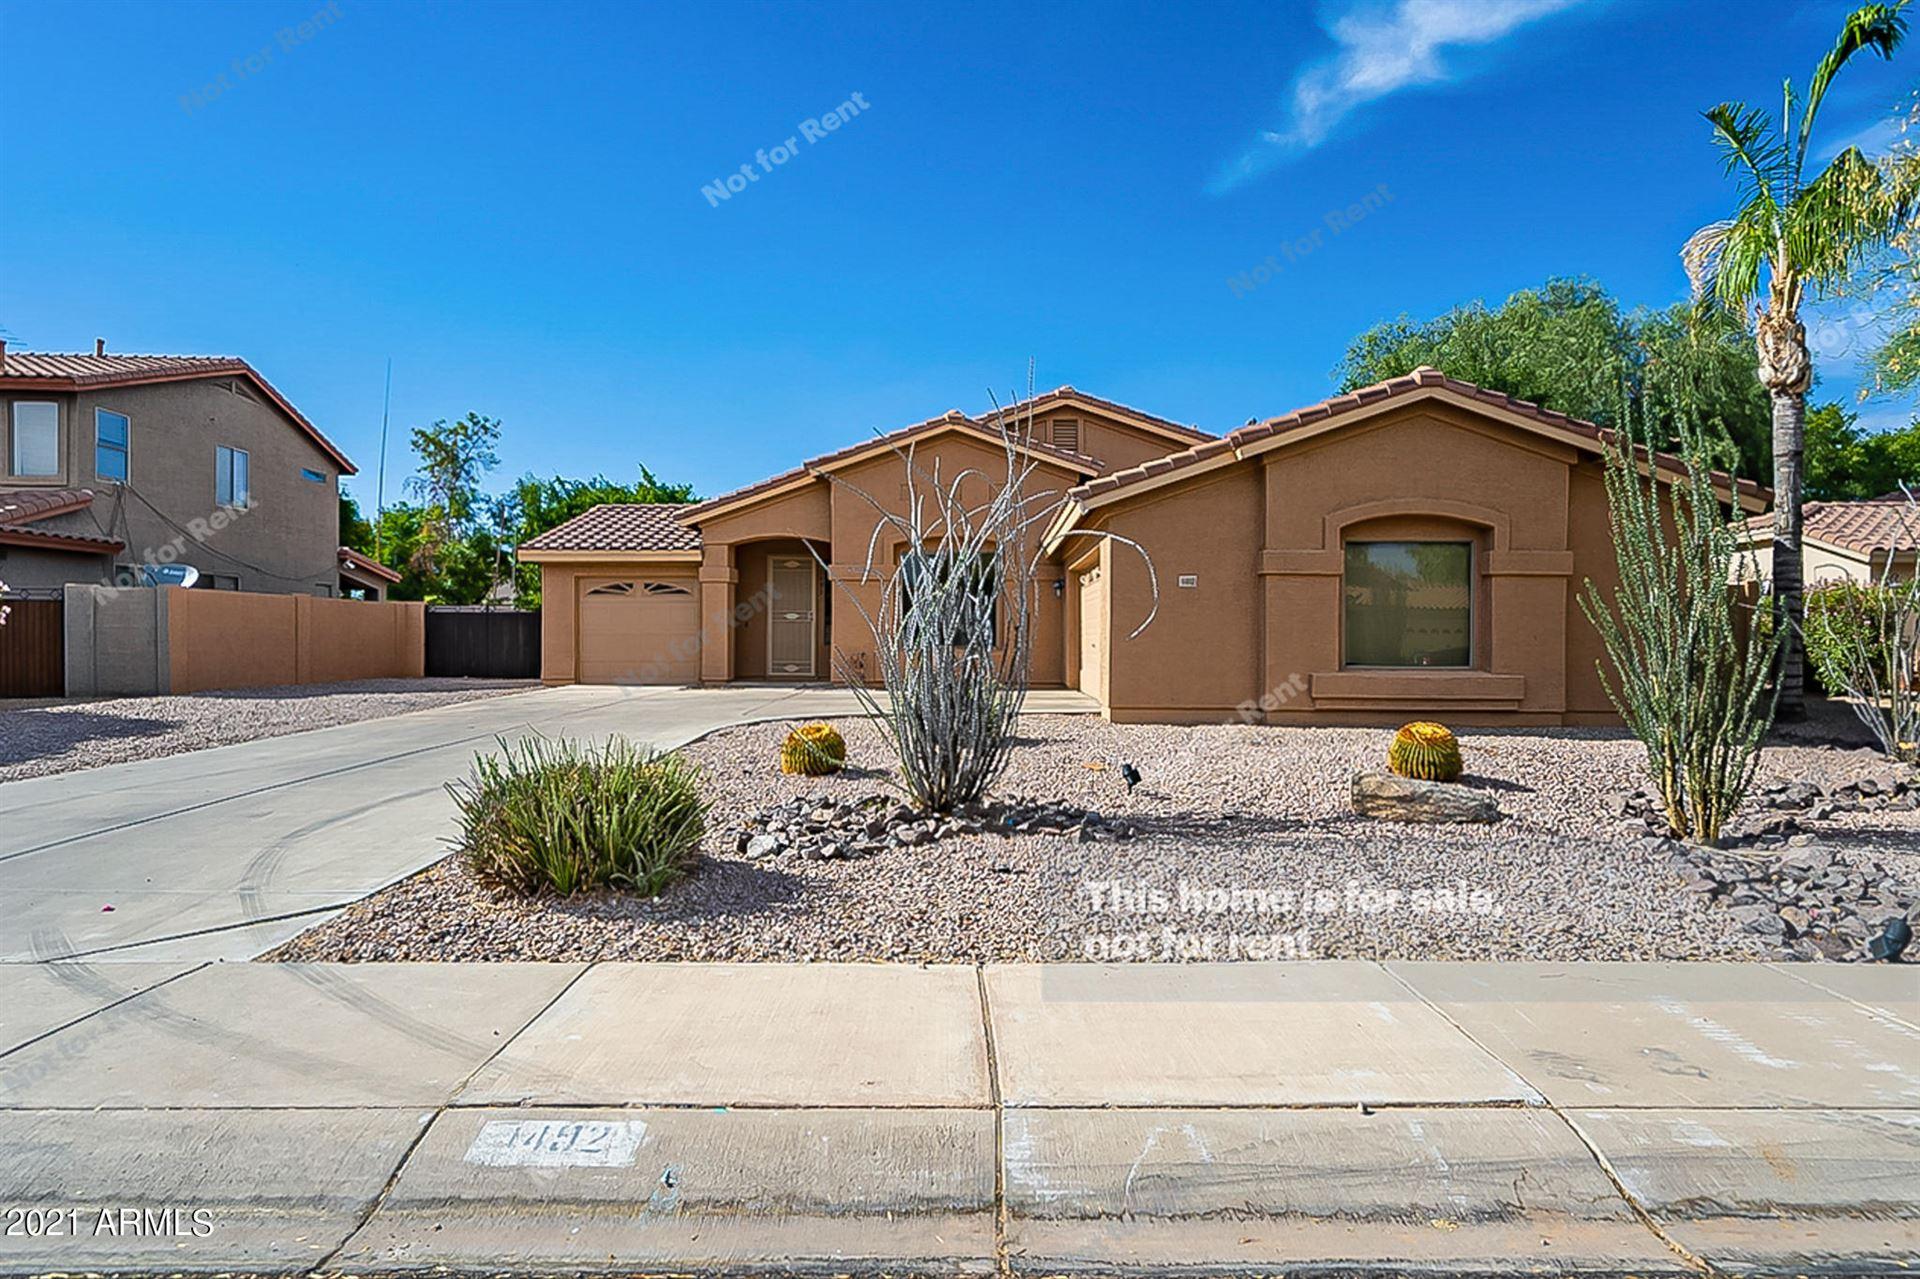 Photo of 1492 E SHAMROCK Street, Gilbert, AZ 85295 (MLS # 6249674)